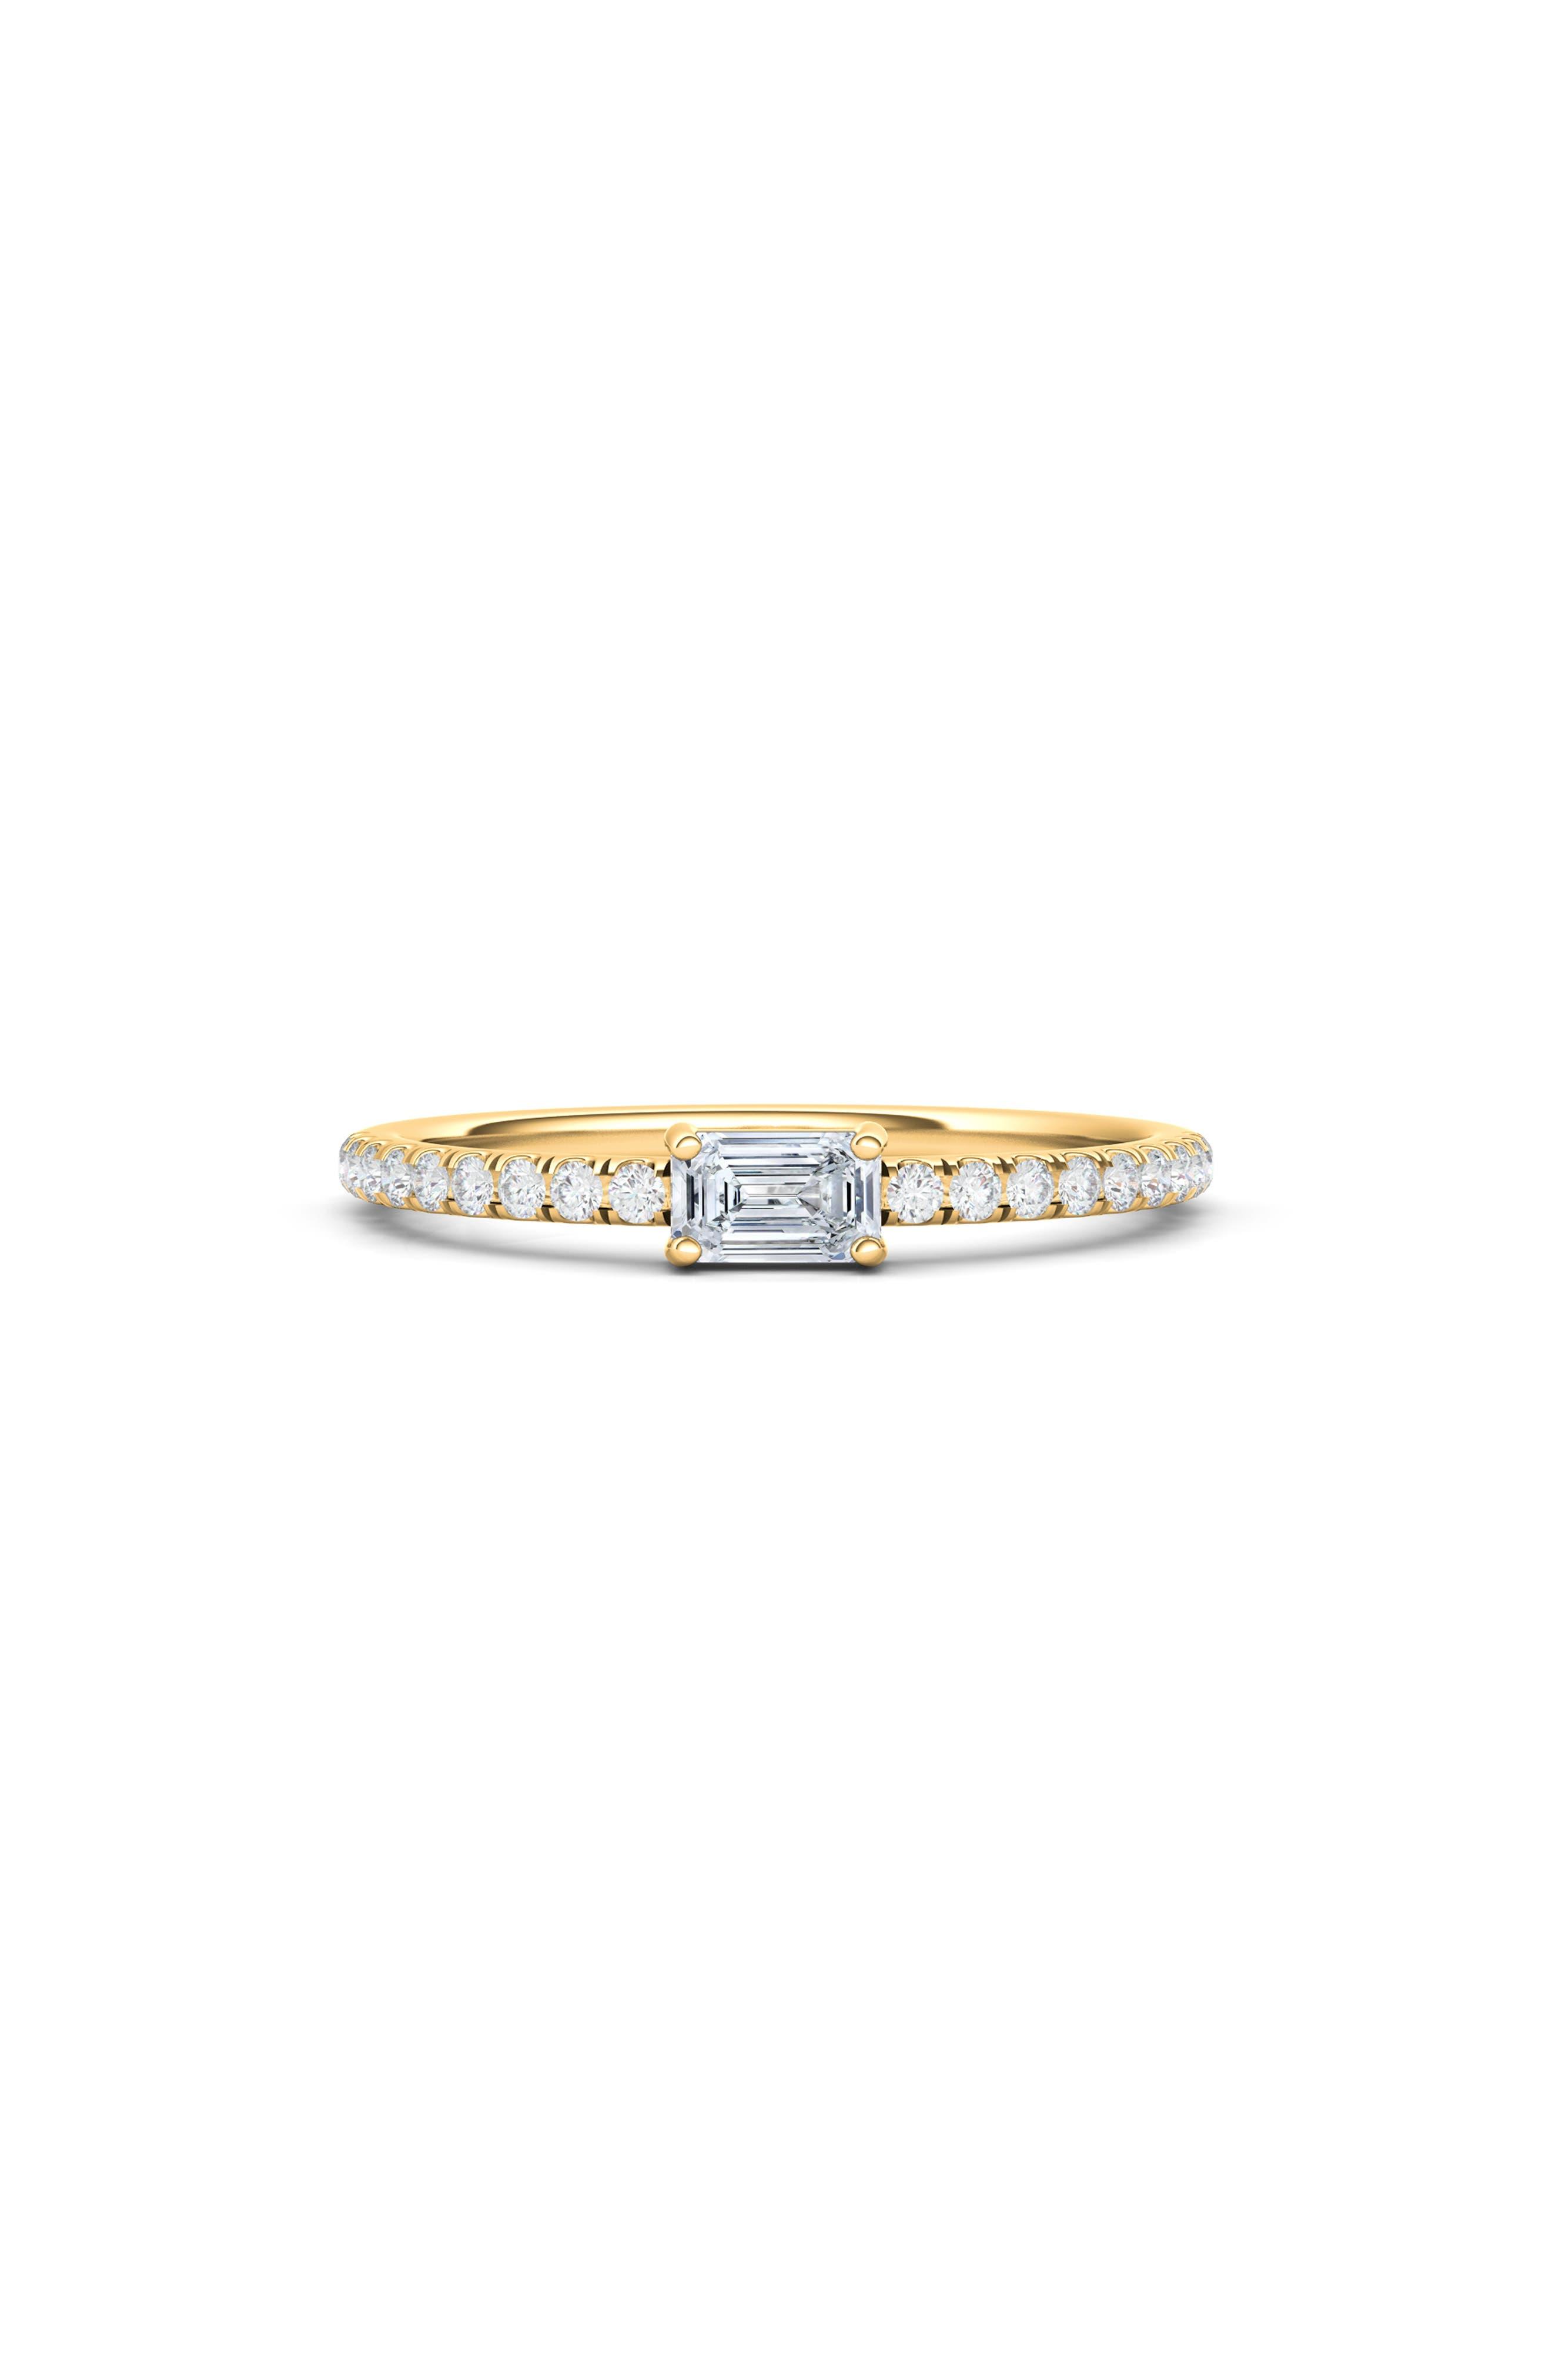 Lab Created Diamond & Pave 14K Gold Ring